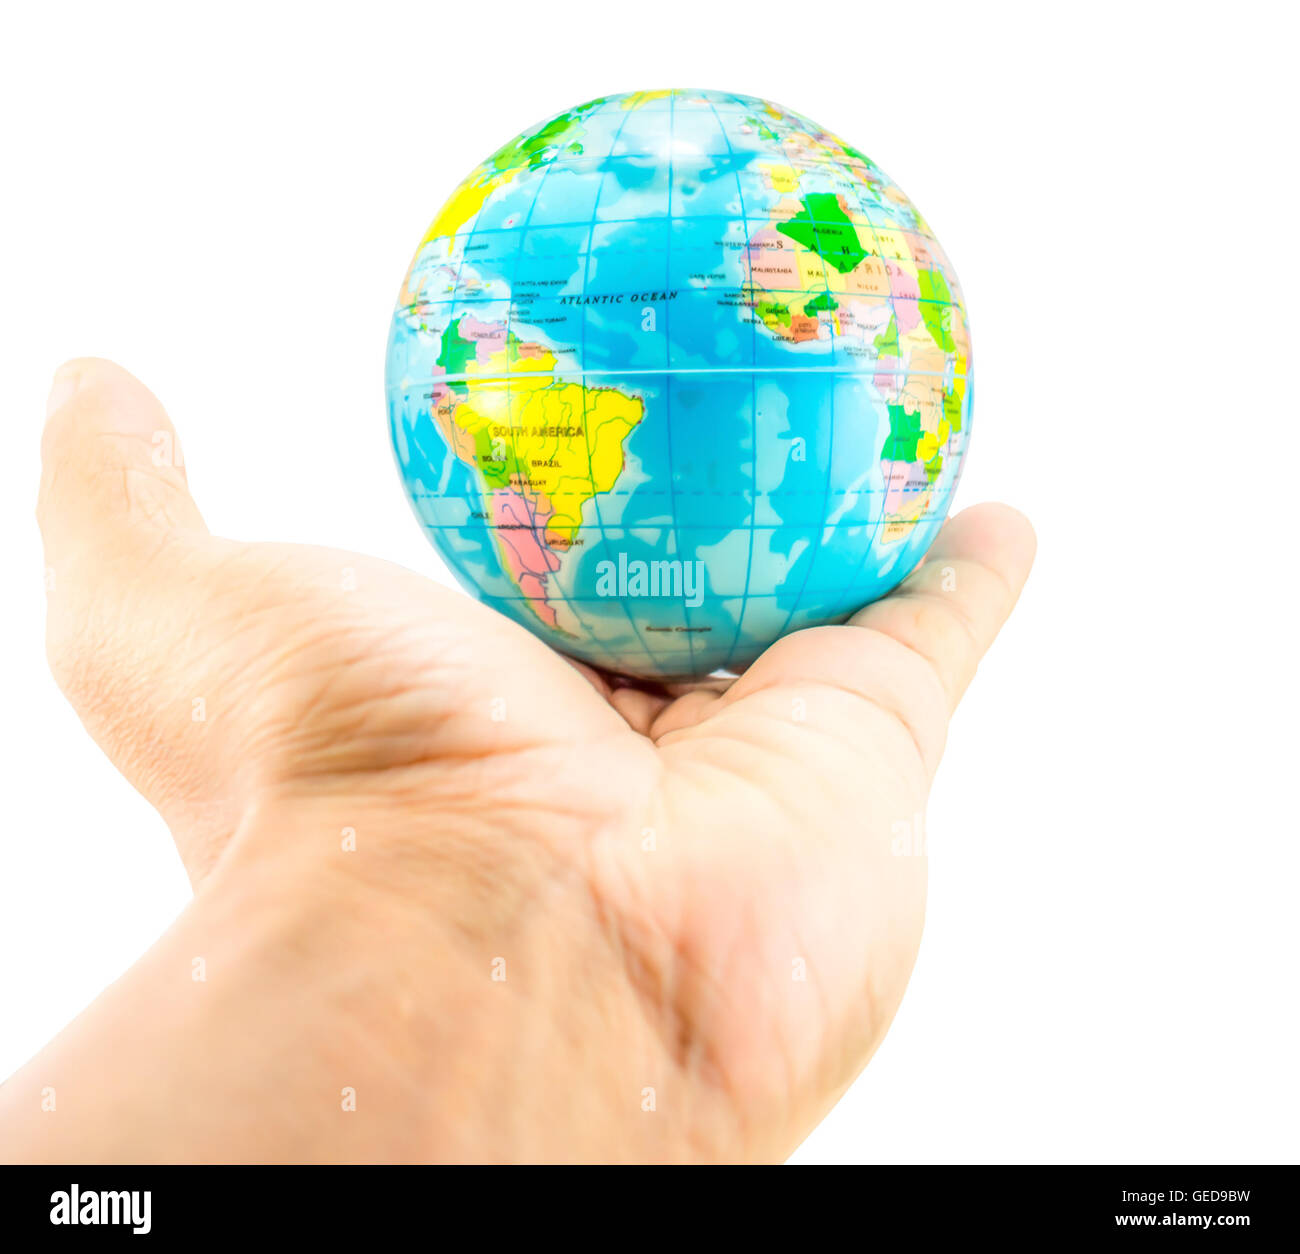 earth on hand - Stock Image